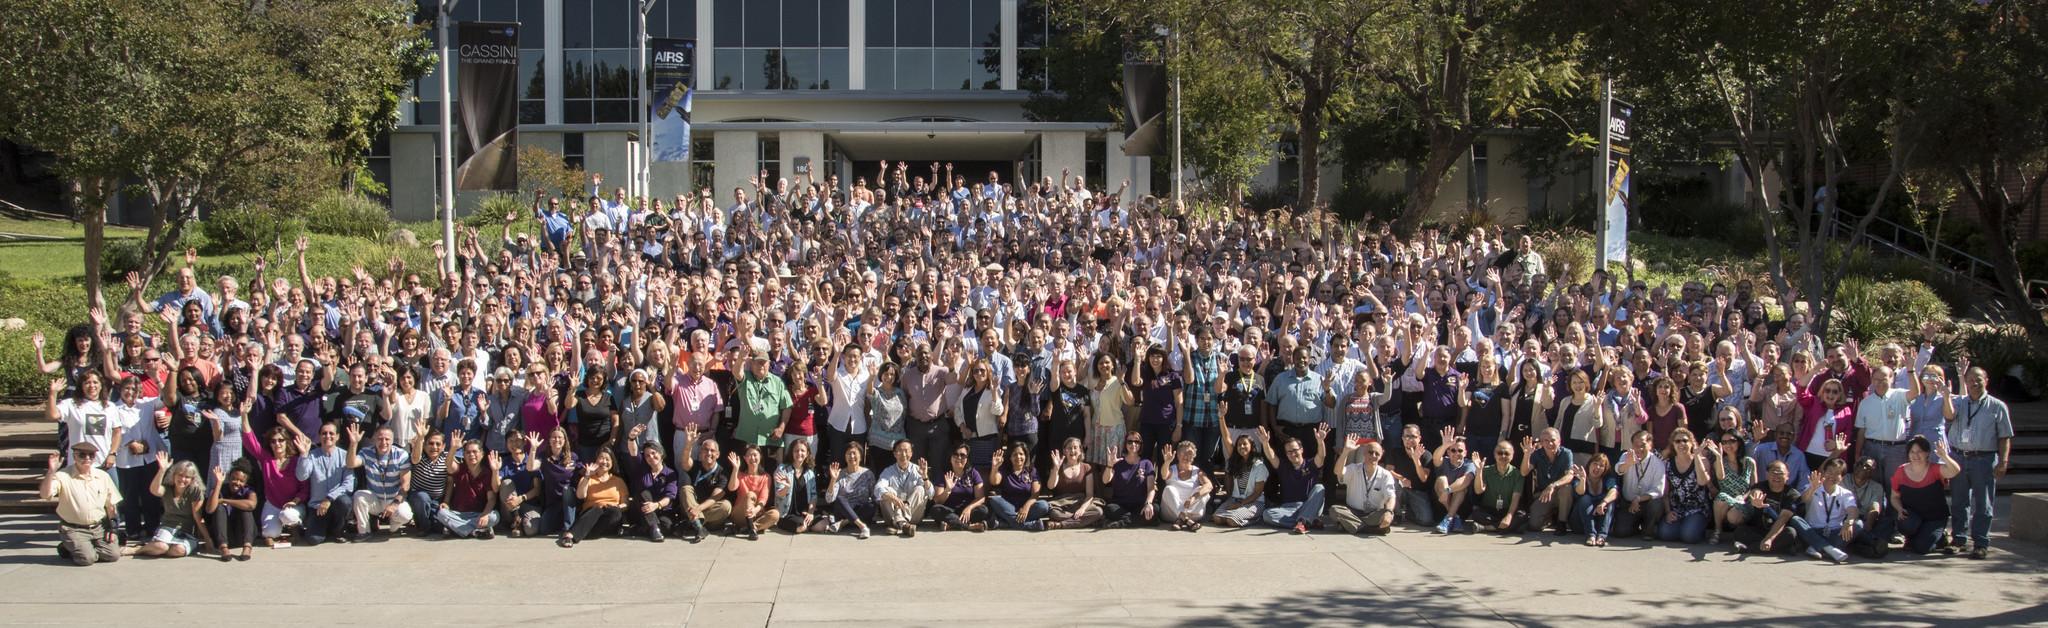 Cassini Groups P2 Requester: Karen Chen Photographer: Bob Paz Date: 2017-06-21 Photolab order: 0709